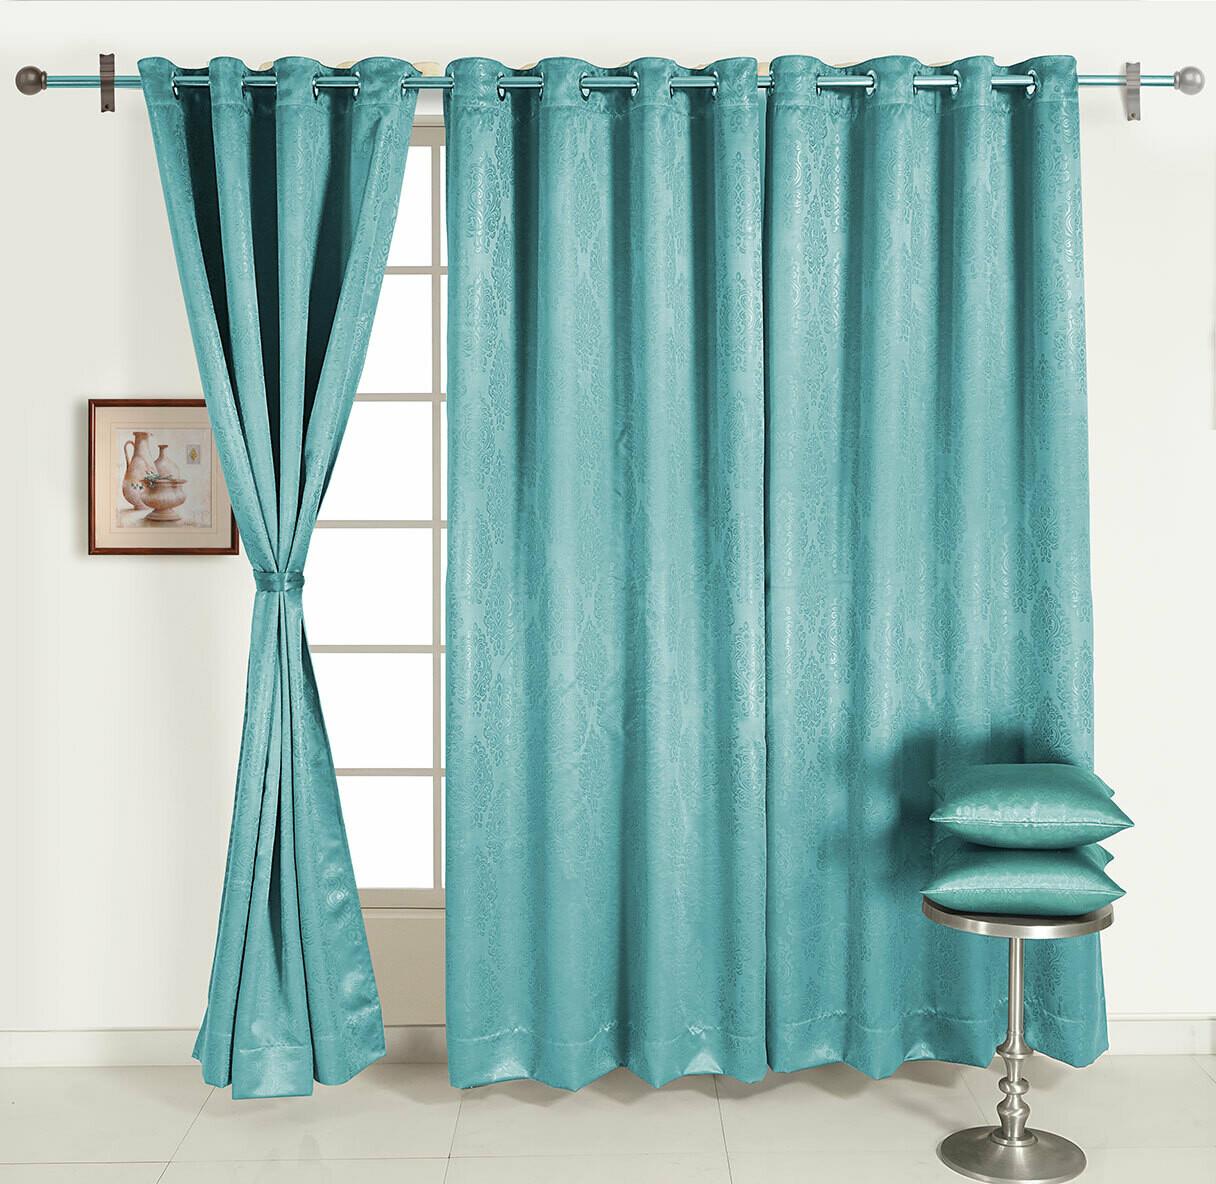 Swayam Turquoise Colour Motif J&B Blackout Eyelet Curtain for Window